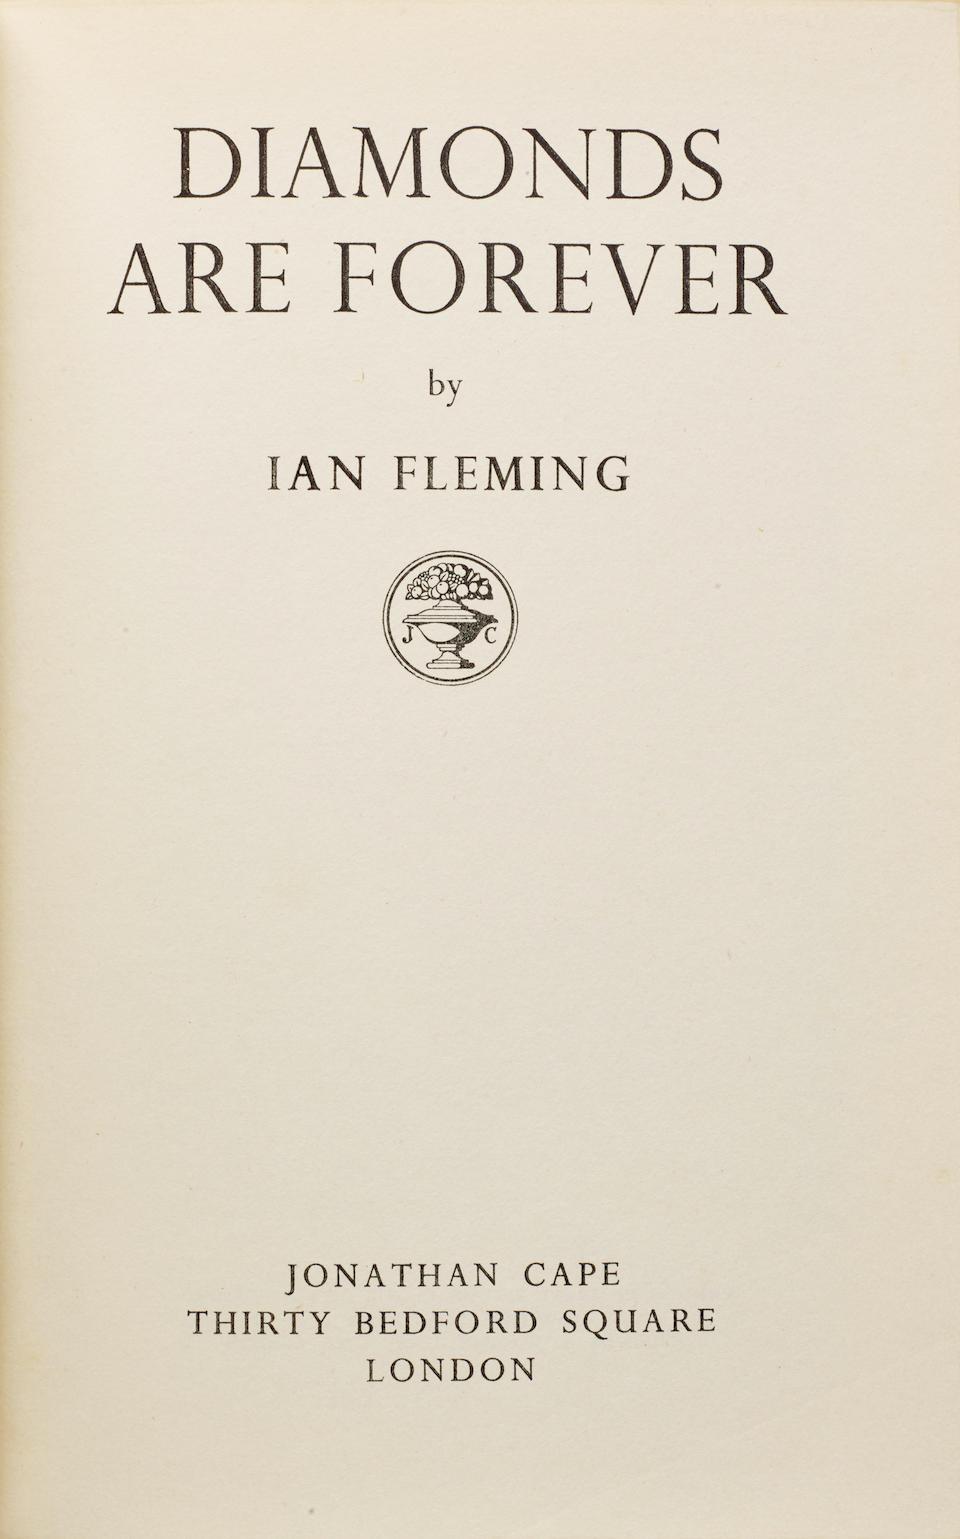 FLEMING, IAN. 1908-1964. 4 James Bond novels: 1. Diamonds Are Forever. London: Jonathan Cape, 1956.